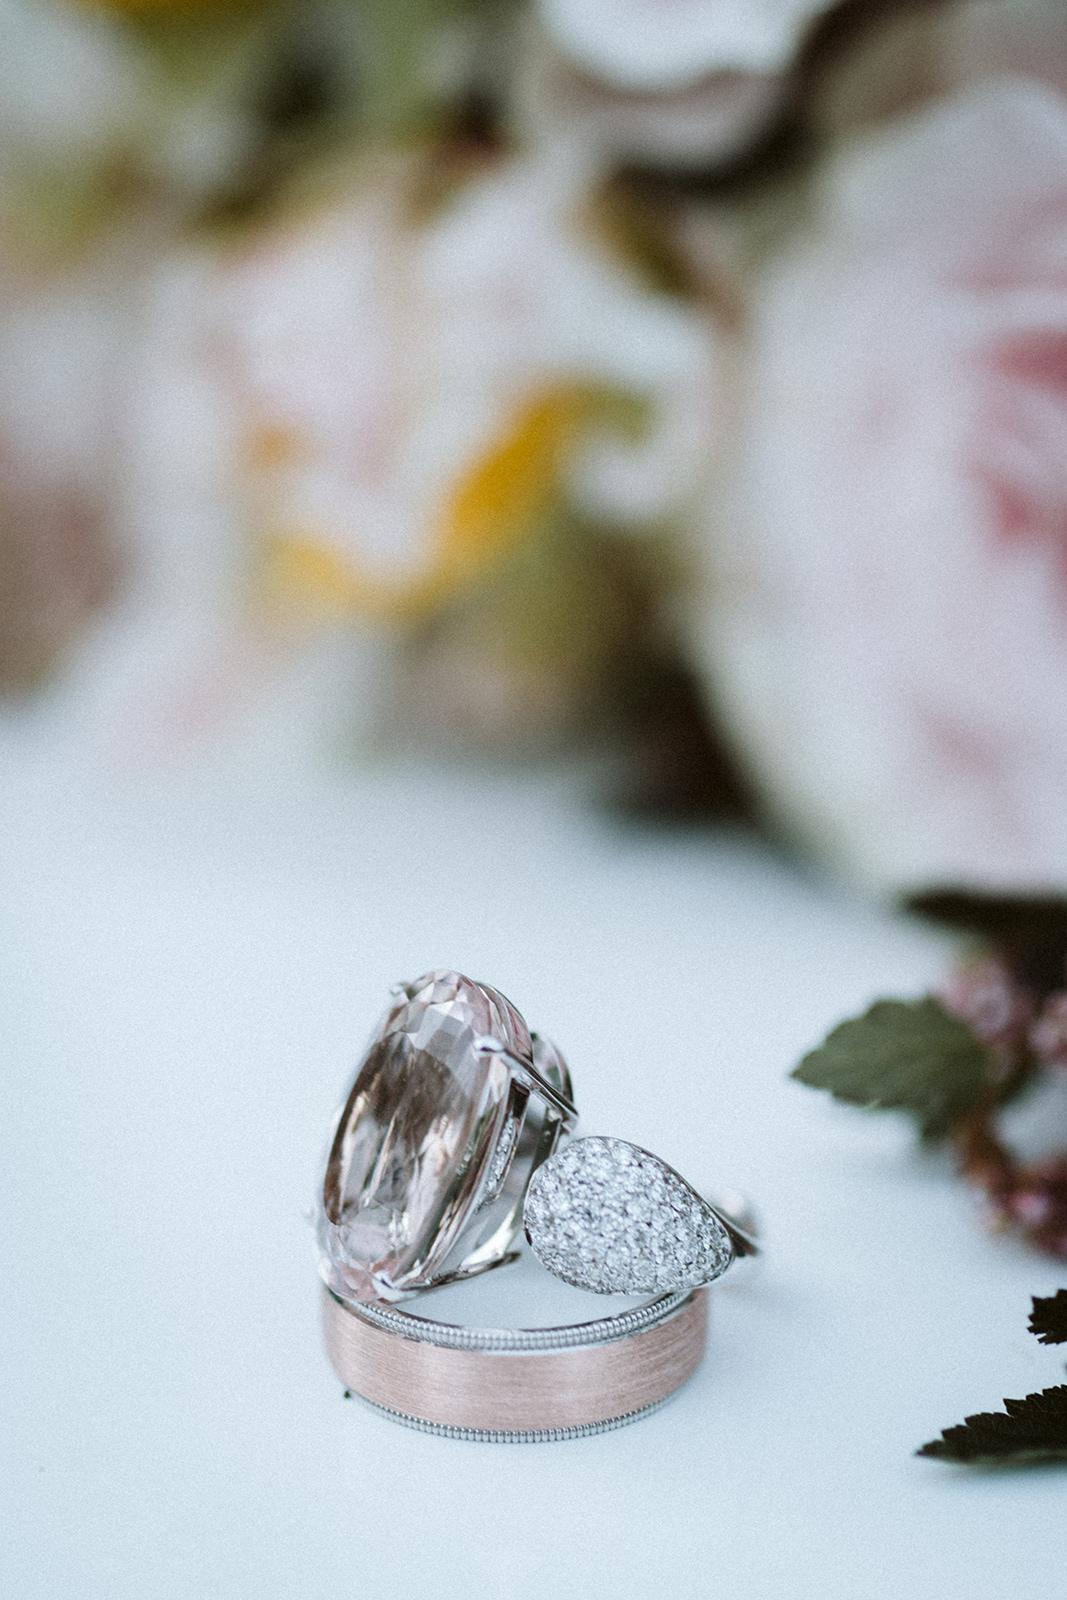 Romantic Rose Engagement Ring Chicago Wedding lisa kathan photography